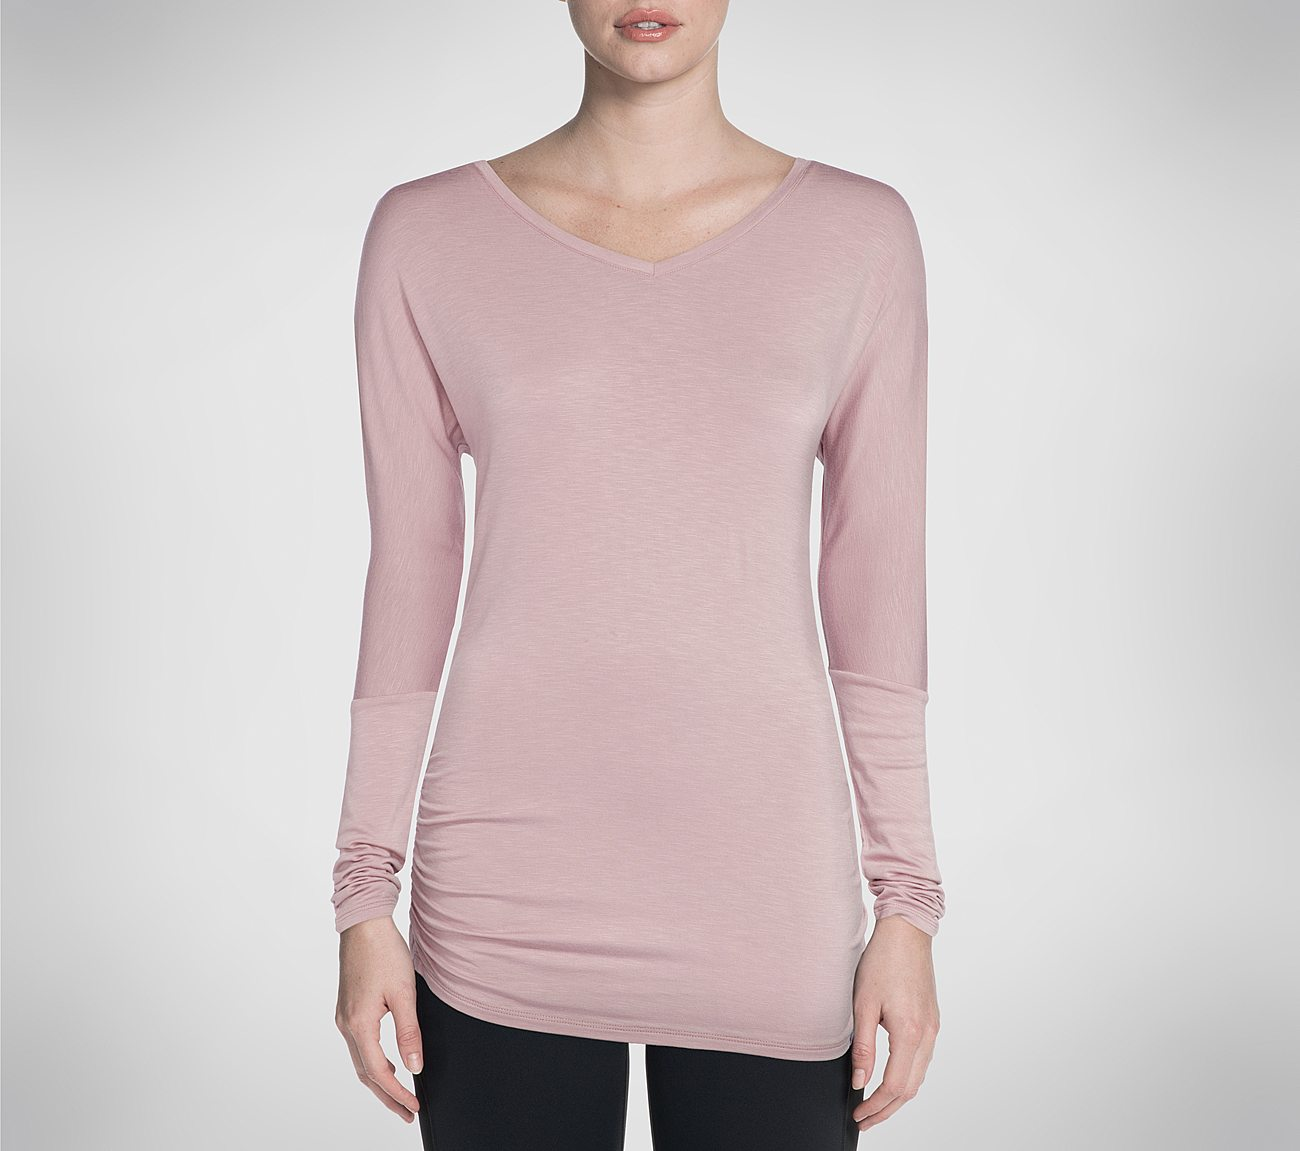 Vitality Long Sleeve Shirt